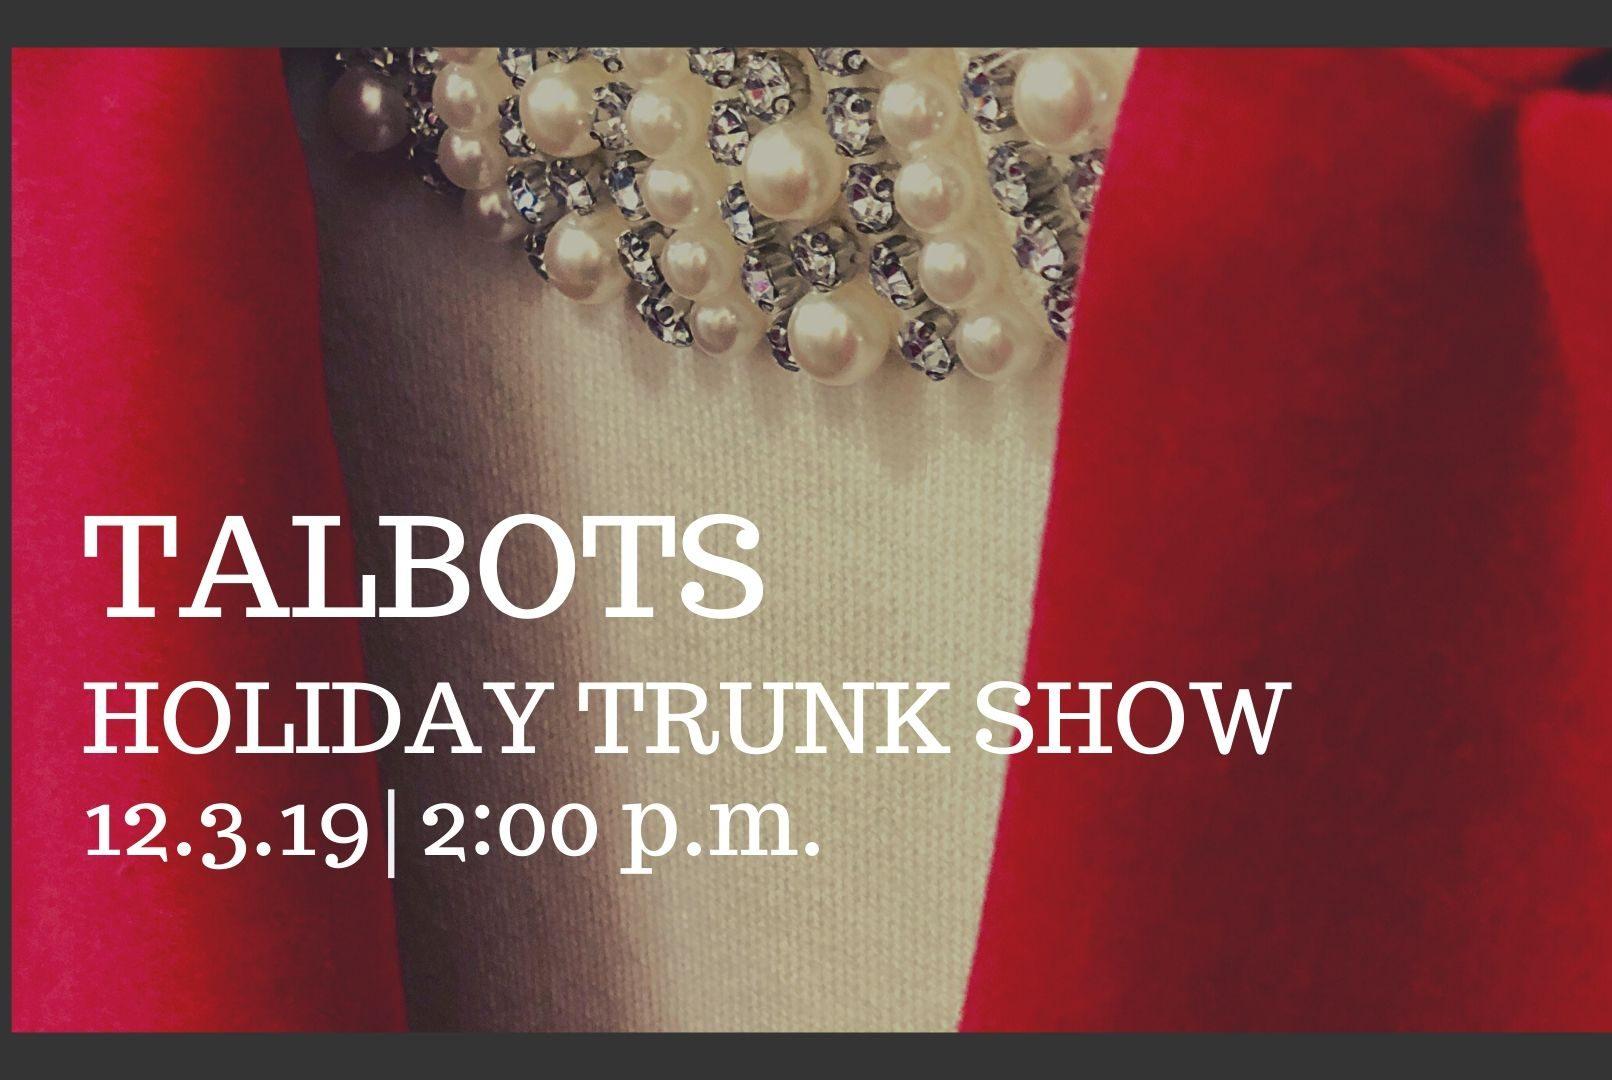 Talbots Trunk Show